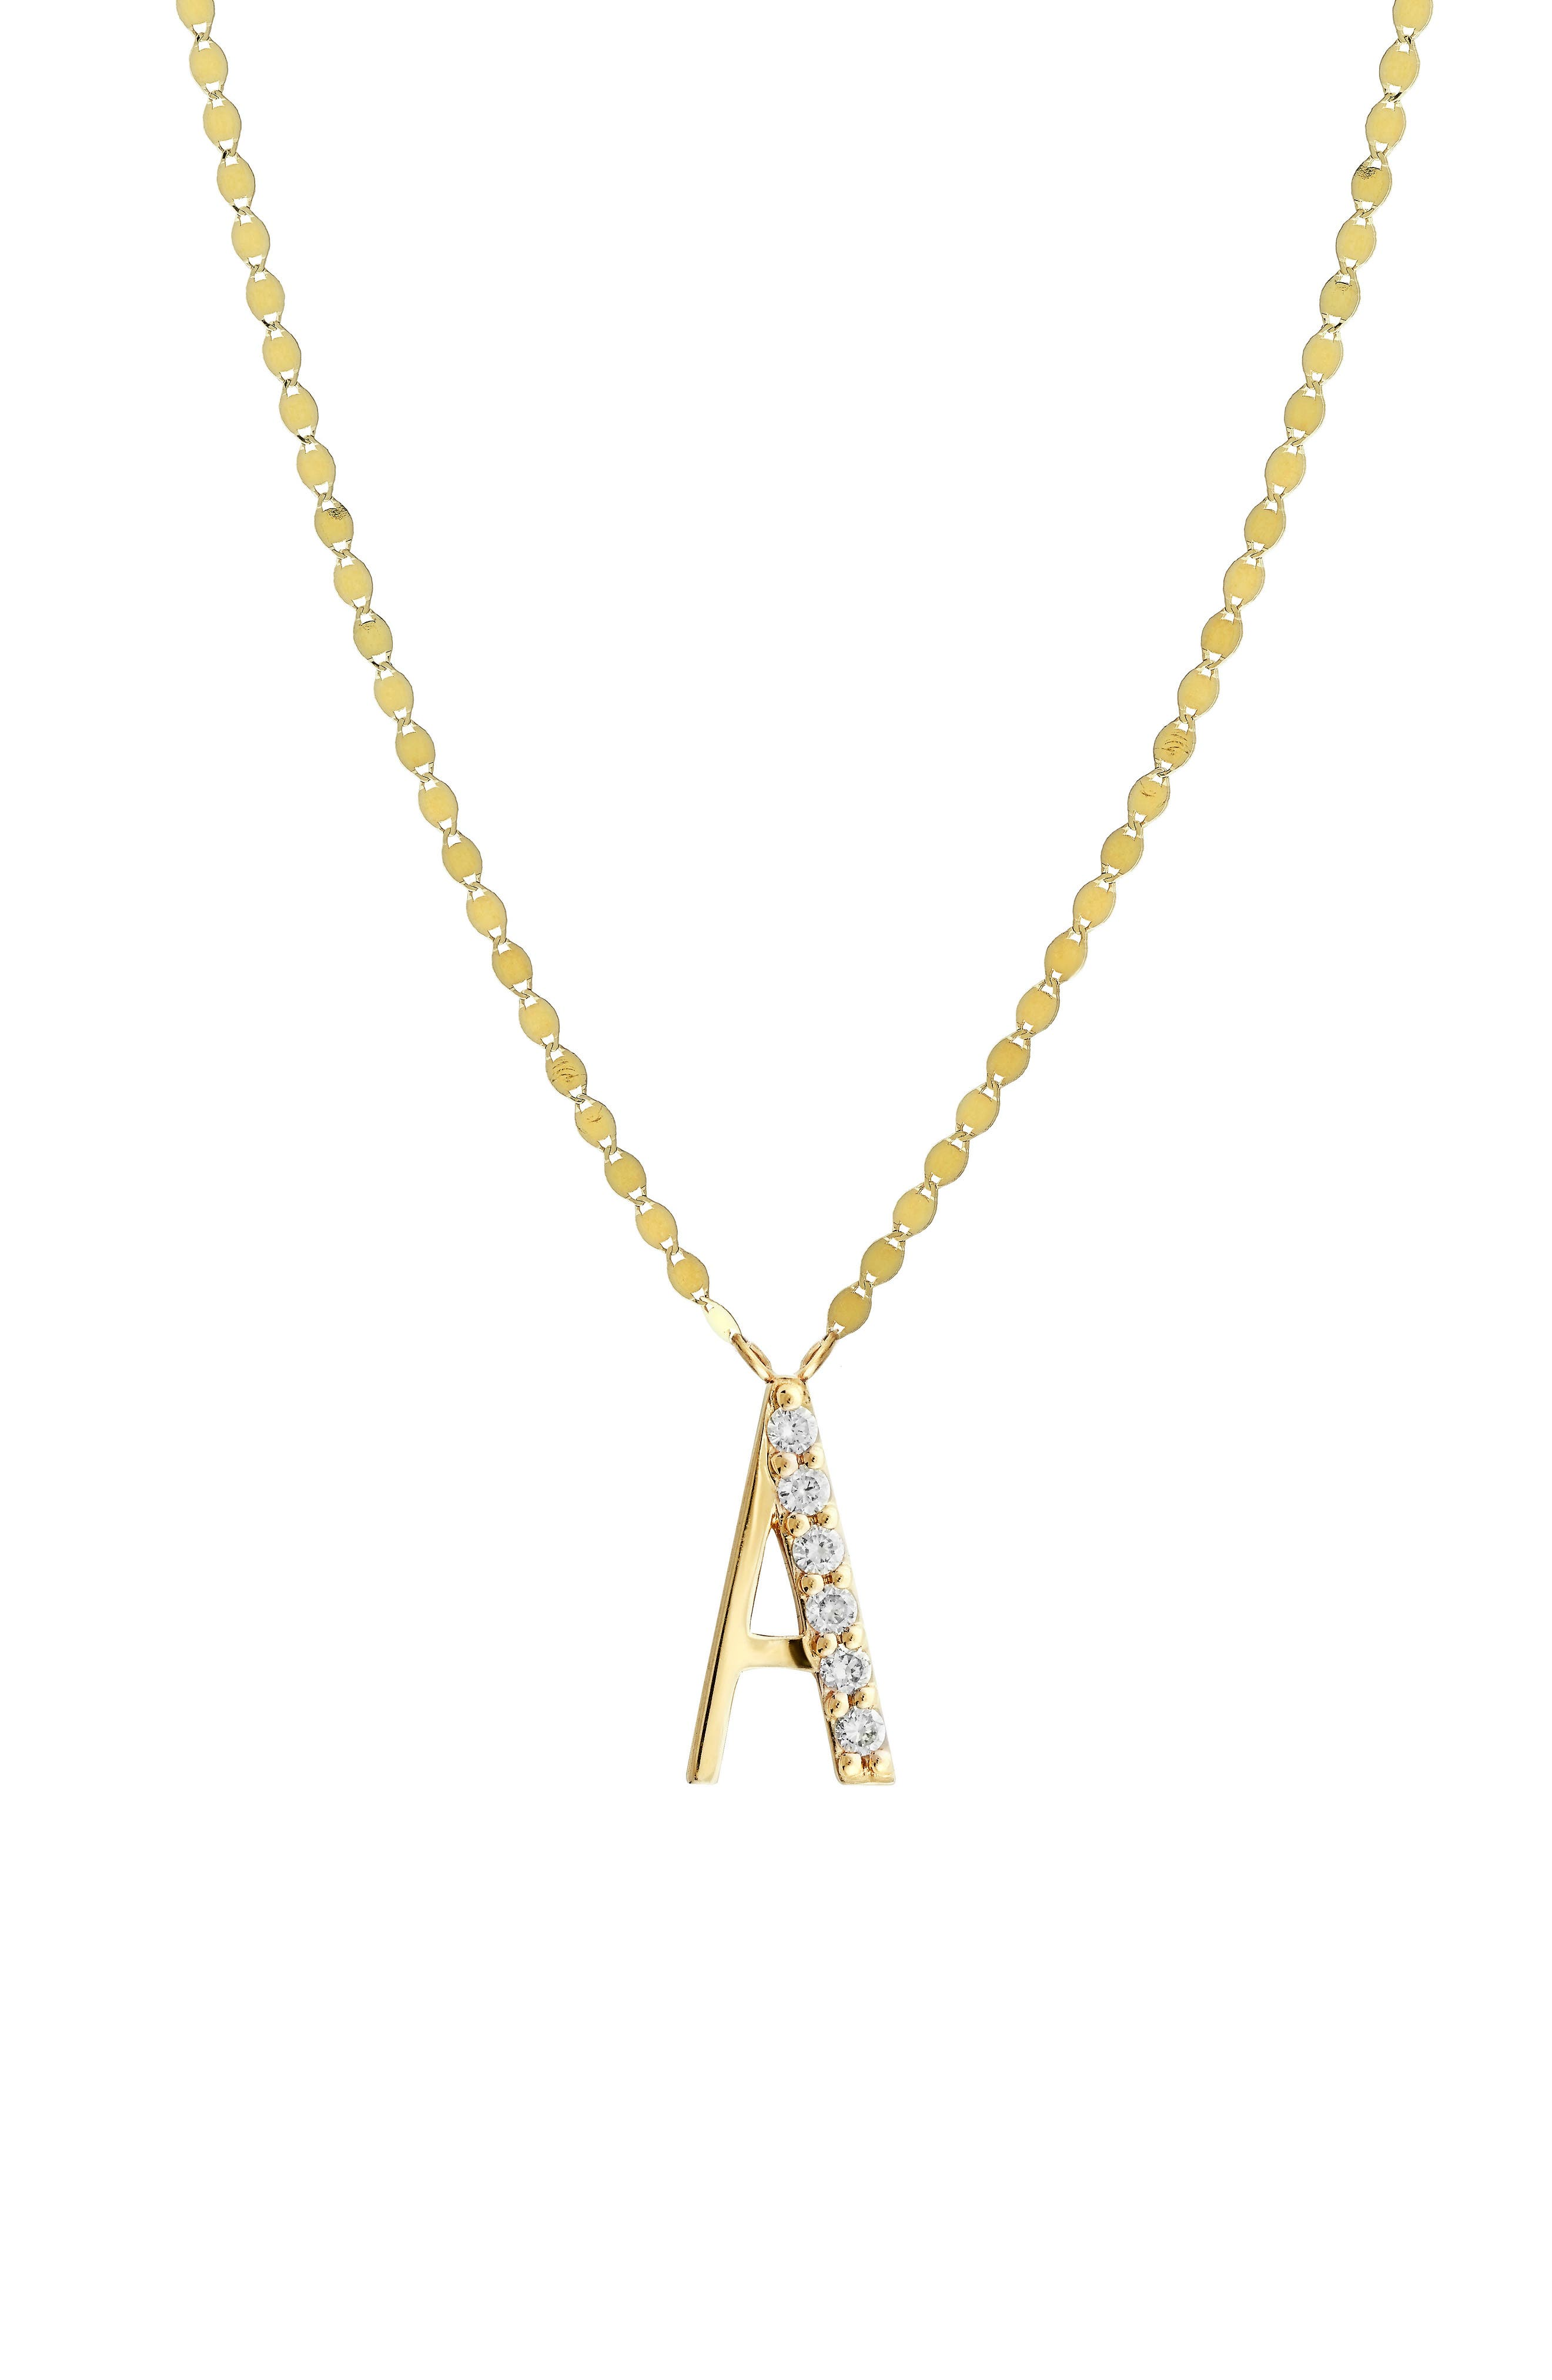 Lana Jewelry Initial Pendant Necklace